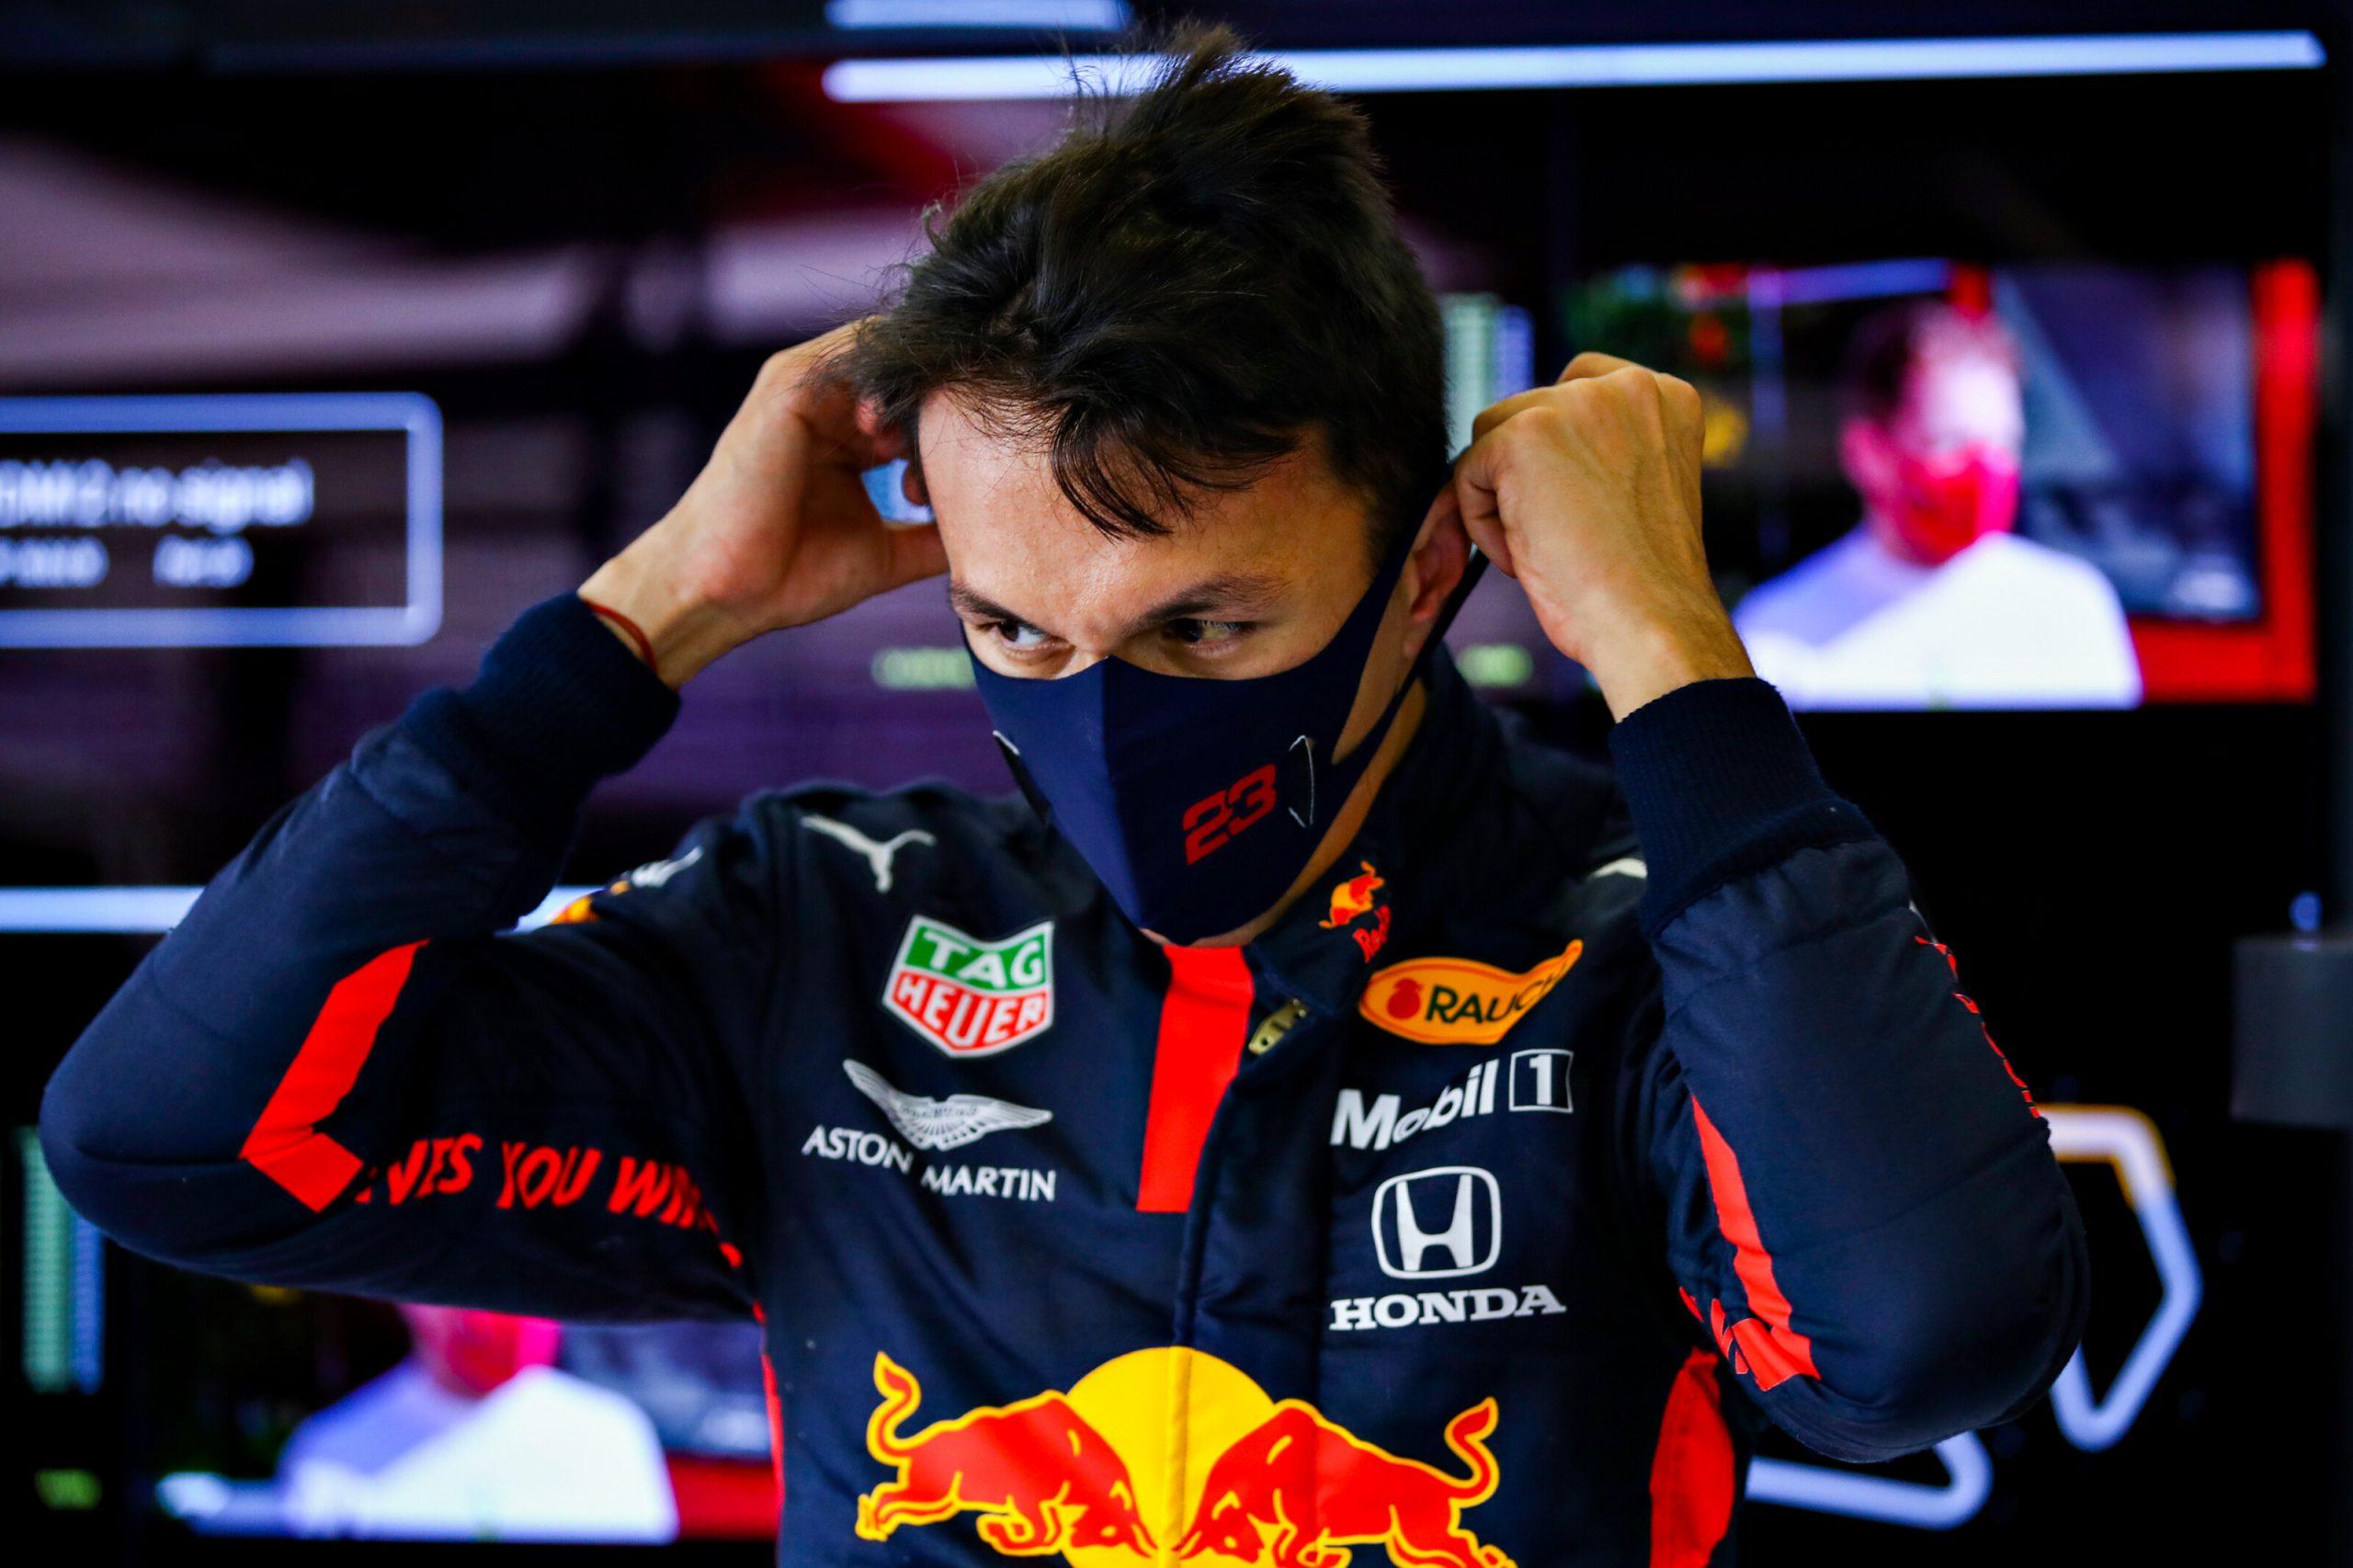 F1 - Red Bull met officiellement la pression à Alex Albon